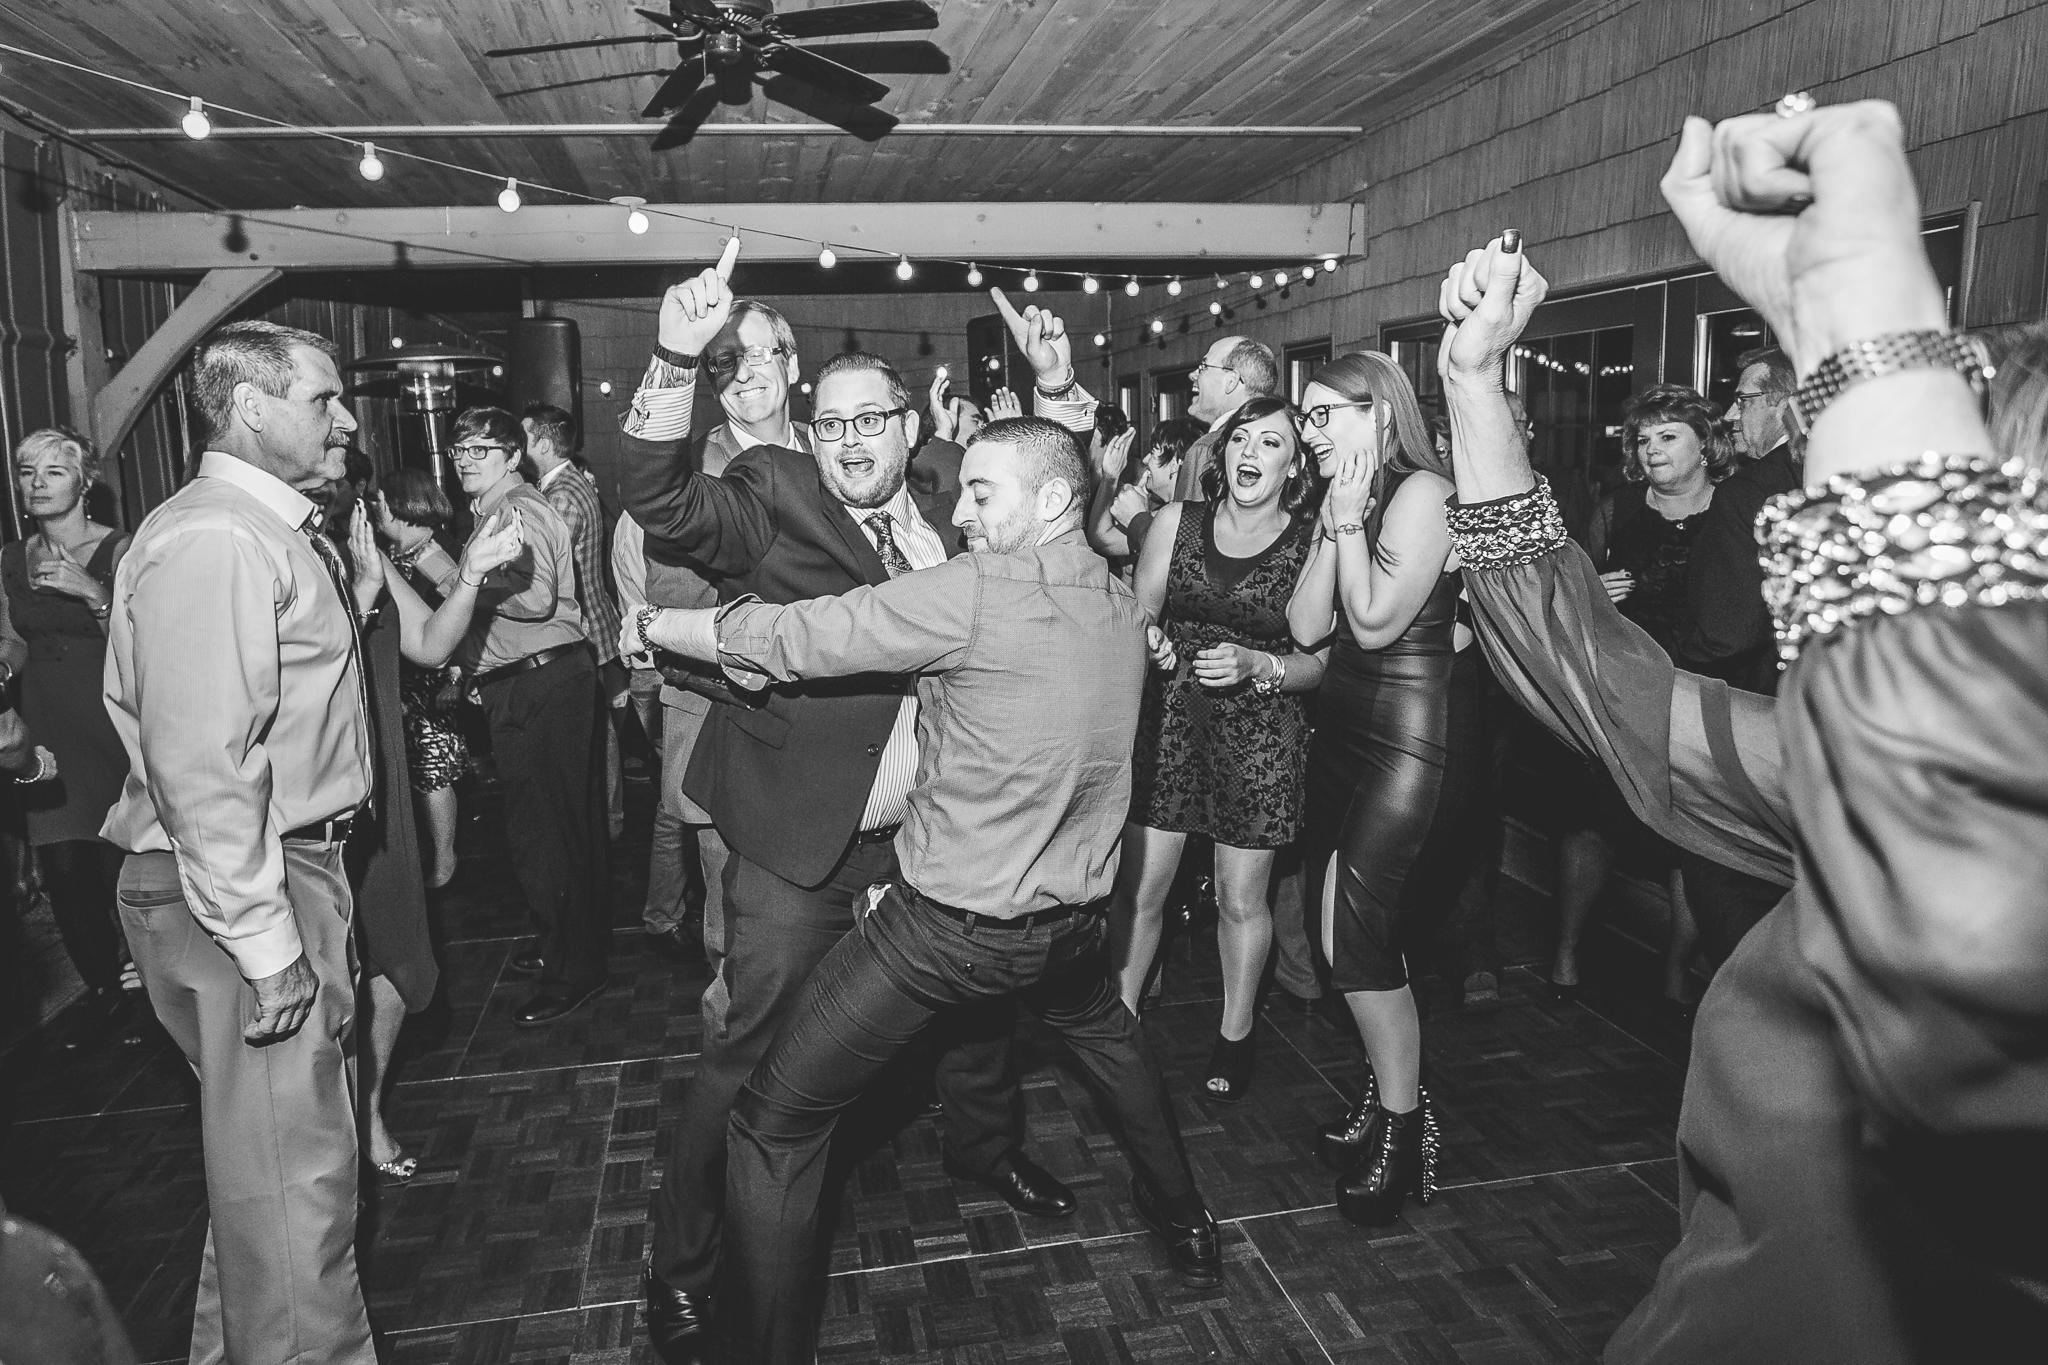 camuglia-whomstudio-chelsea_and_andy-nycphotographer-wedding-brooklyn-buffalo-timberlodge-159-5699.jpg